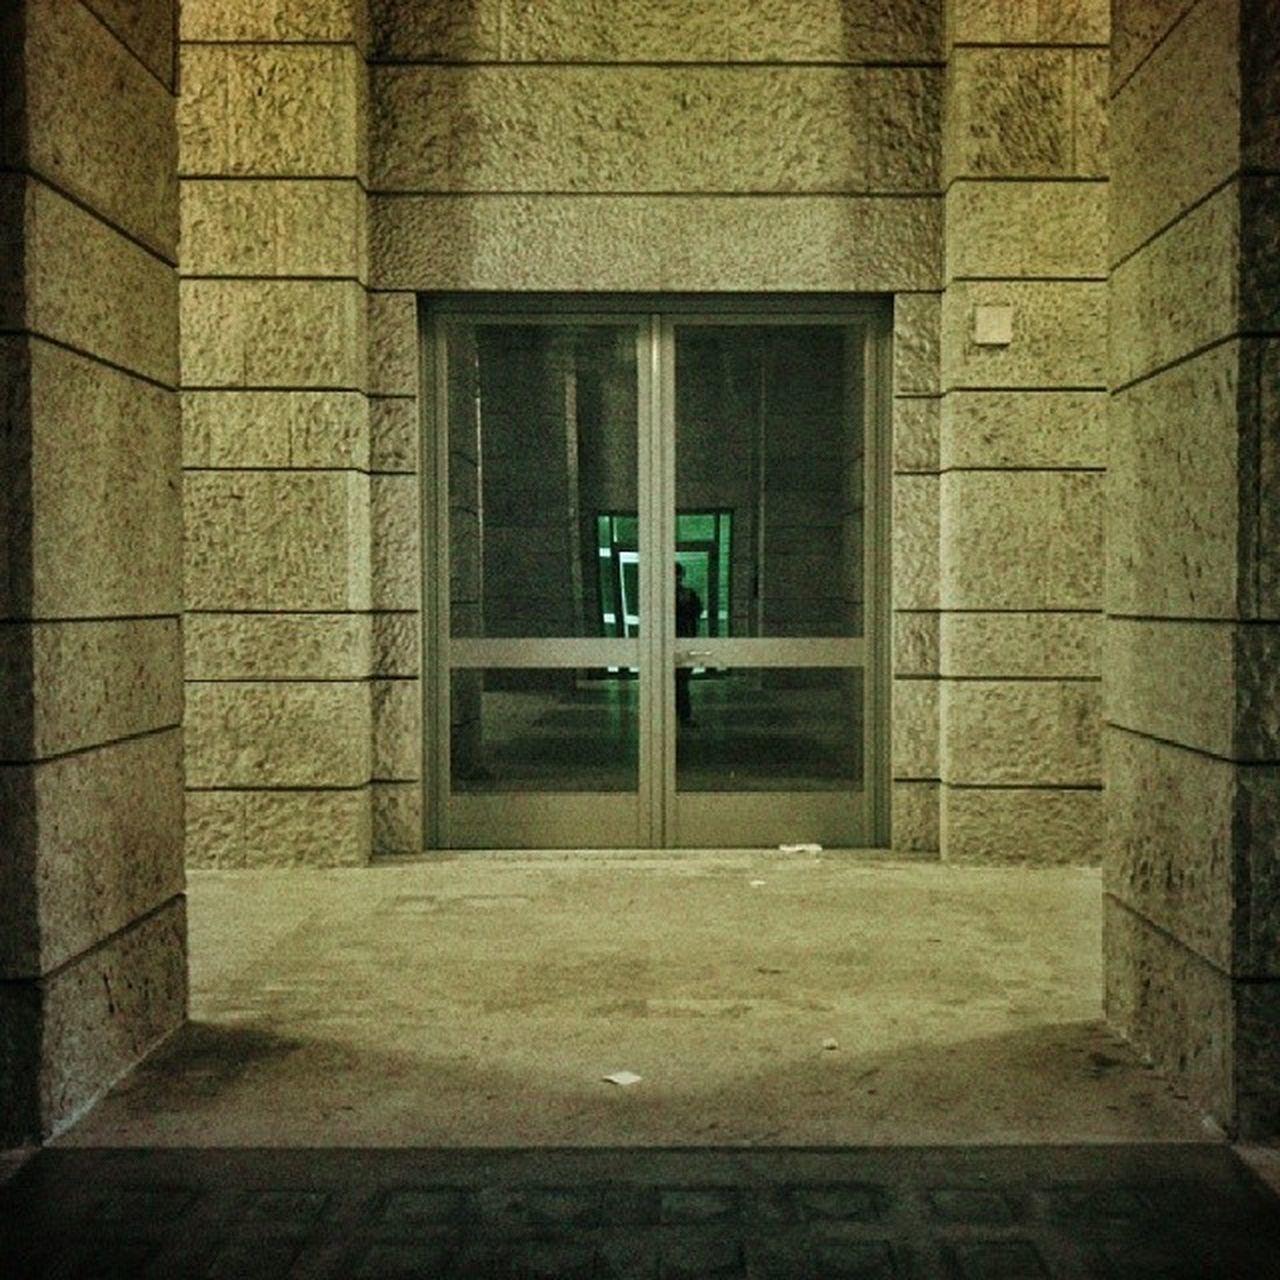 architecture, built structure, door, no people, window, building exterior, day, outdoors